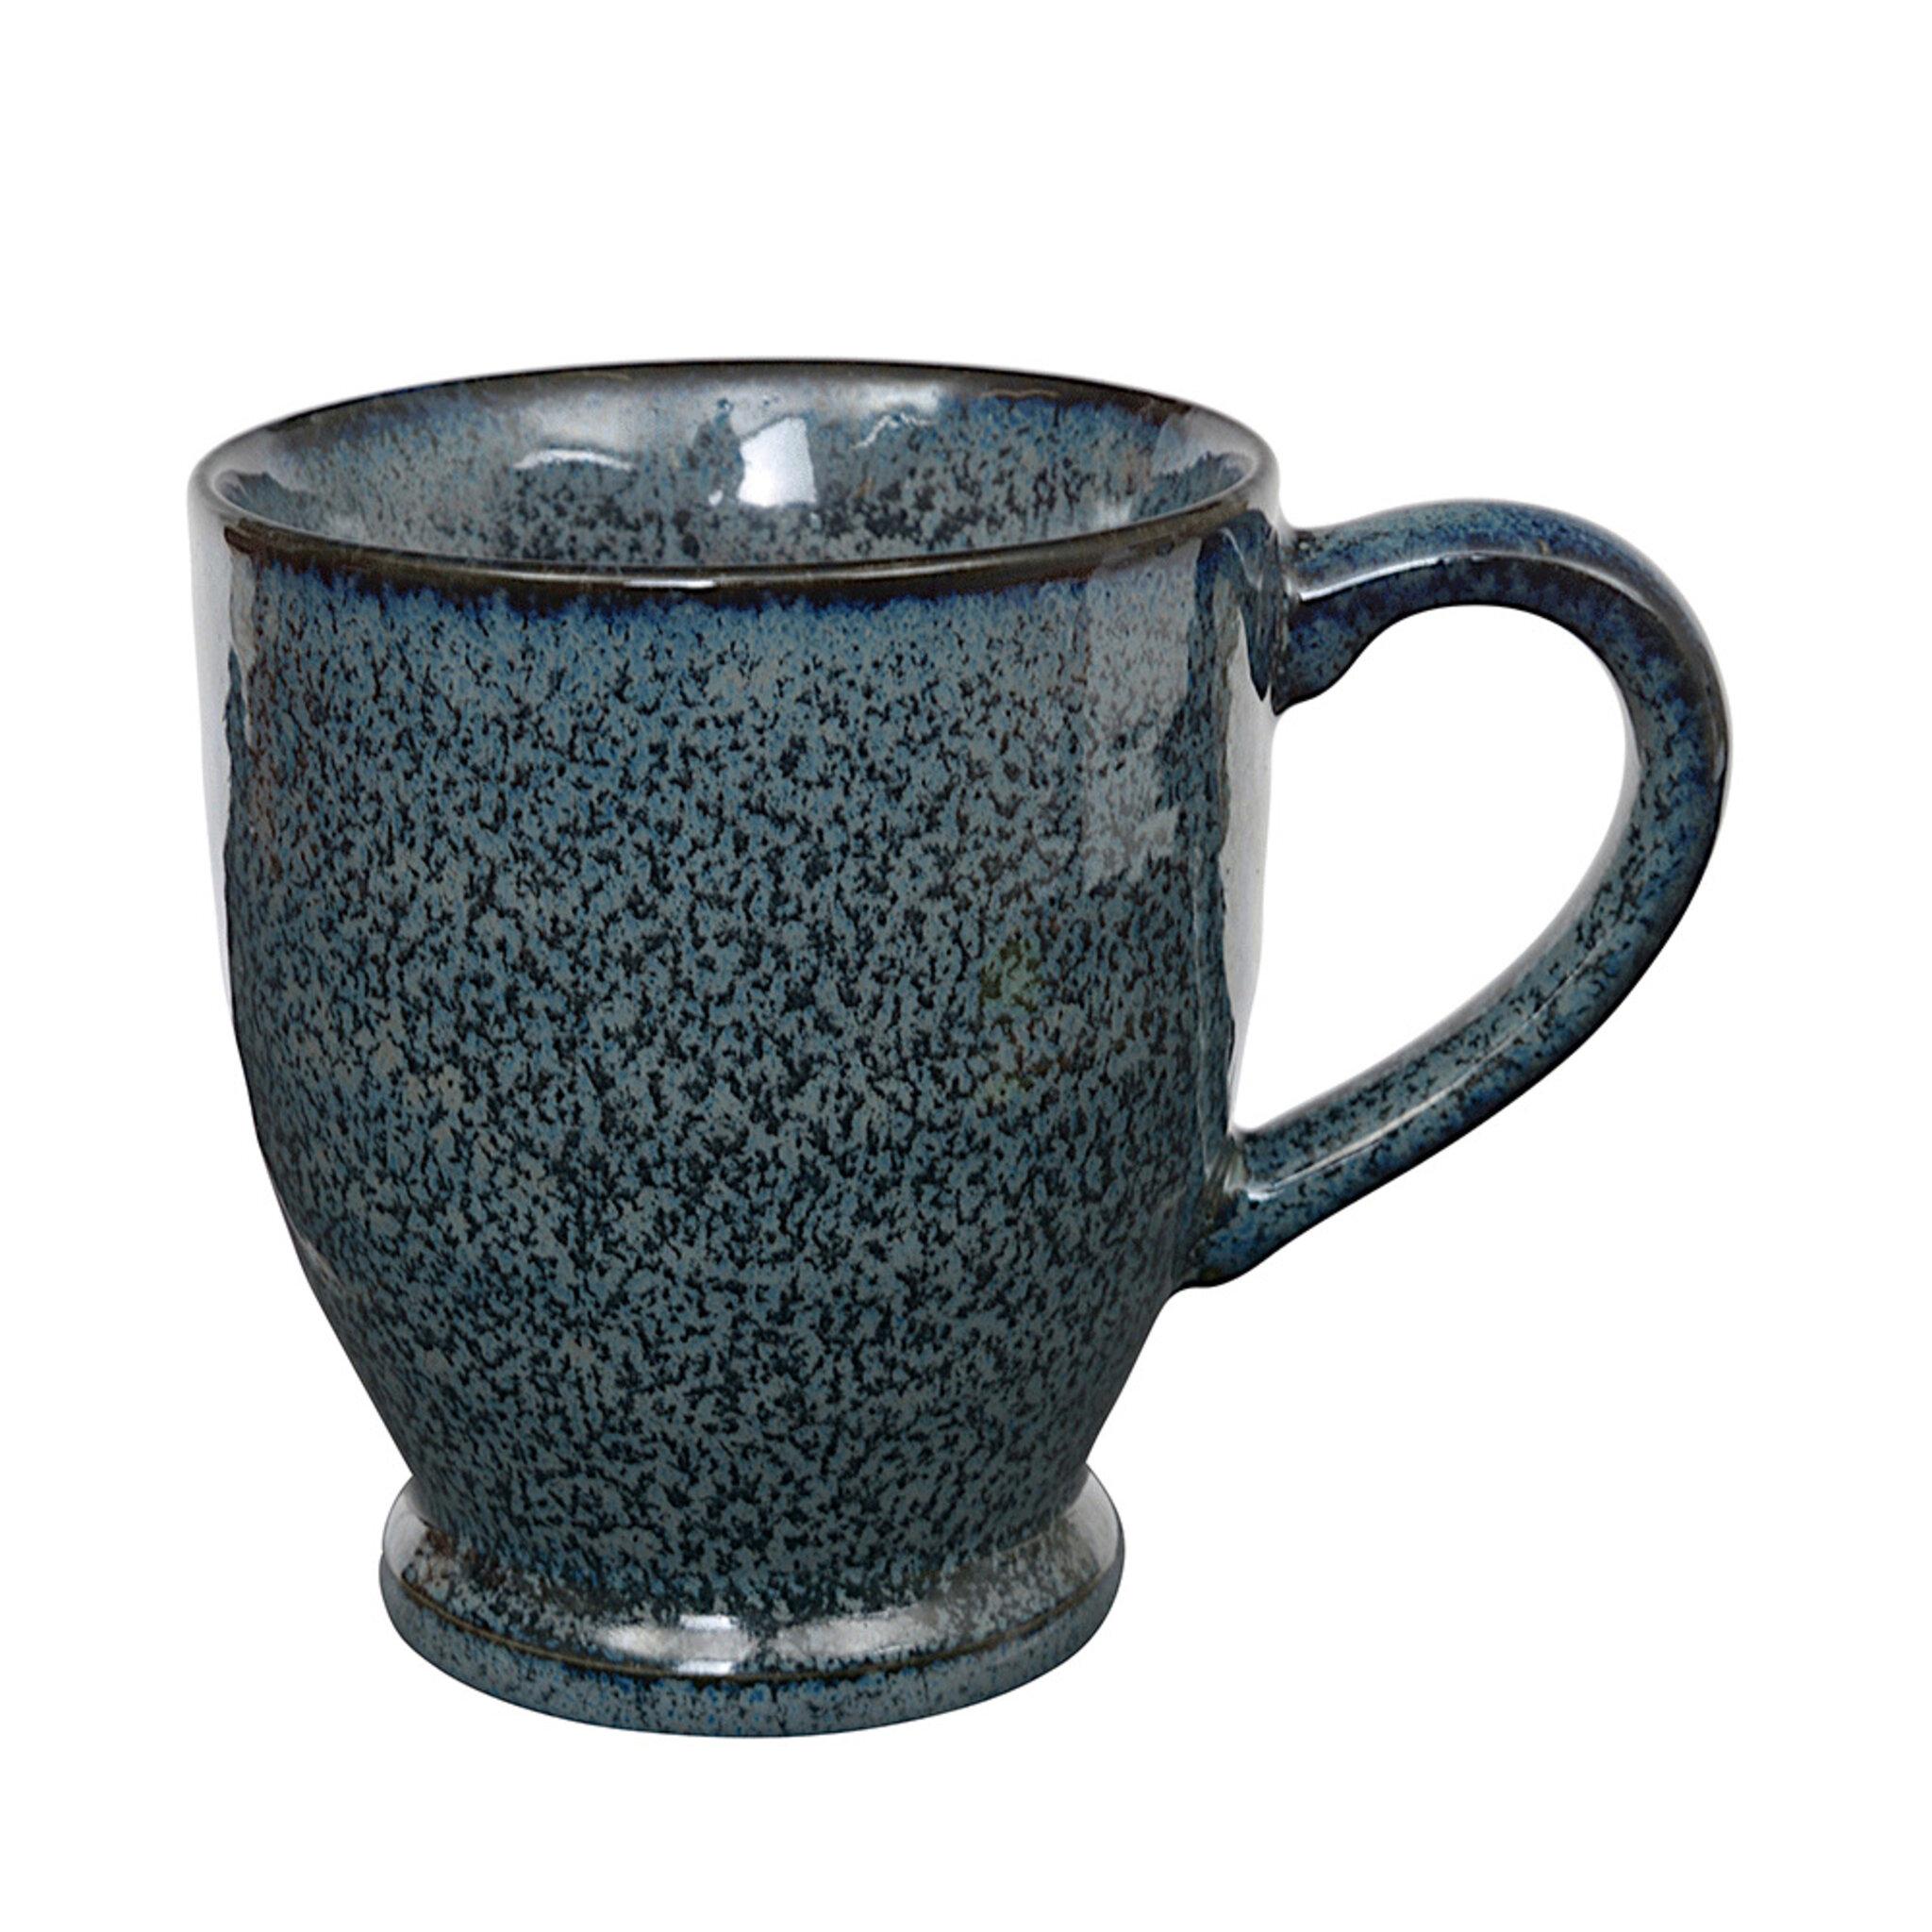 Mugg med öra Cobalt blue 8×9 cm 8X9CM